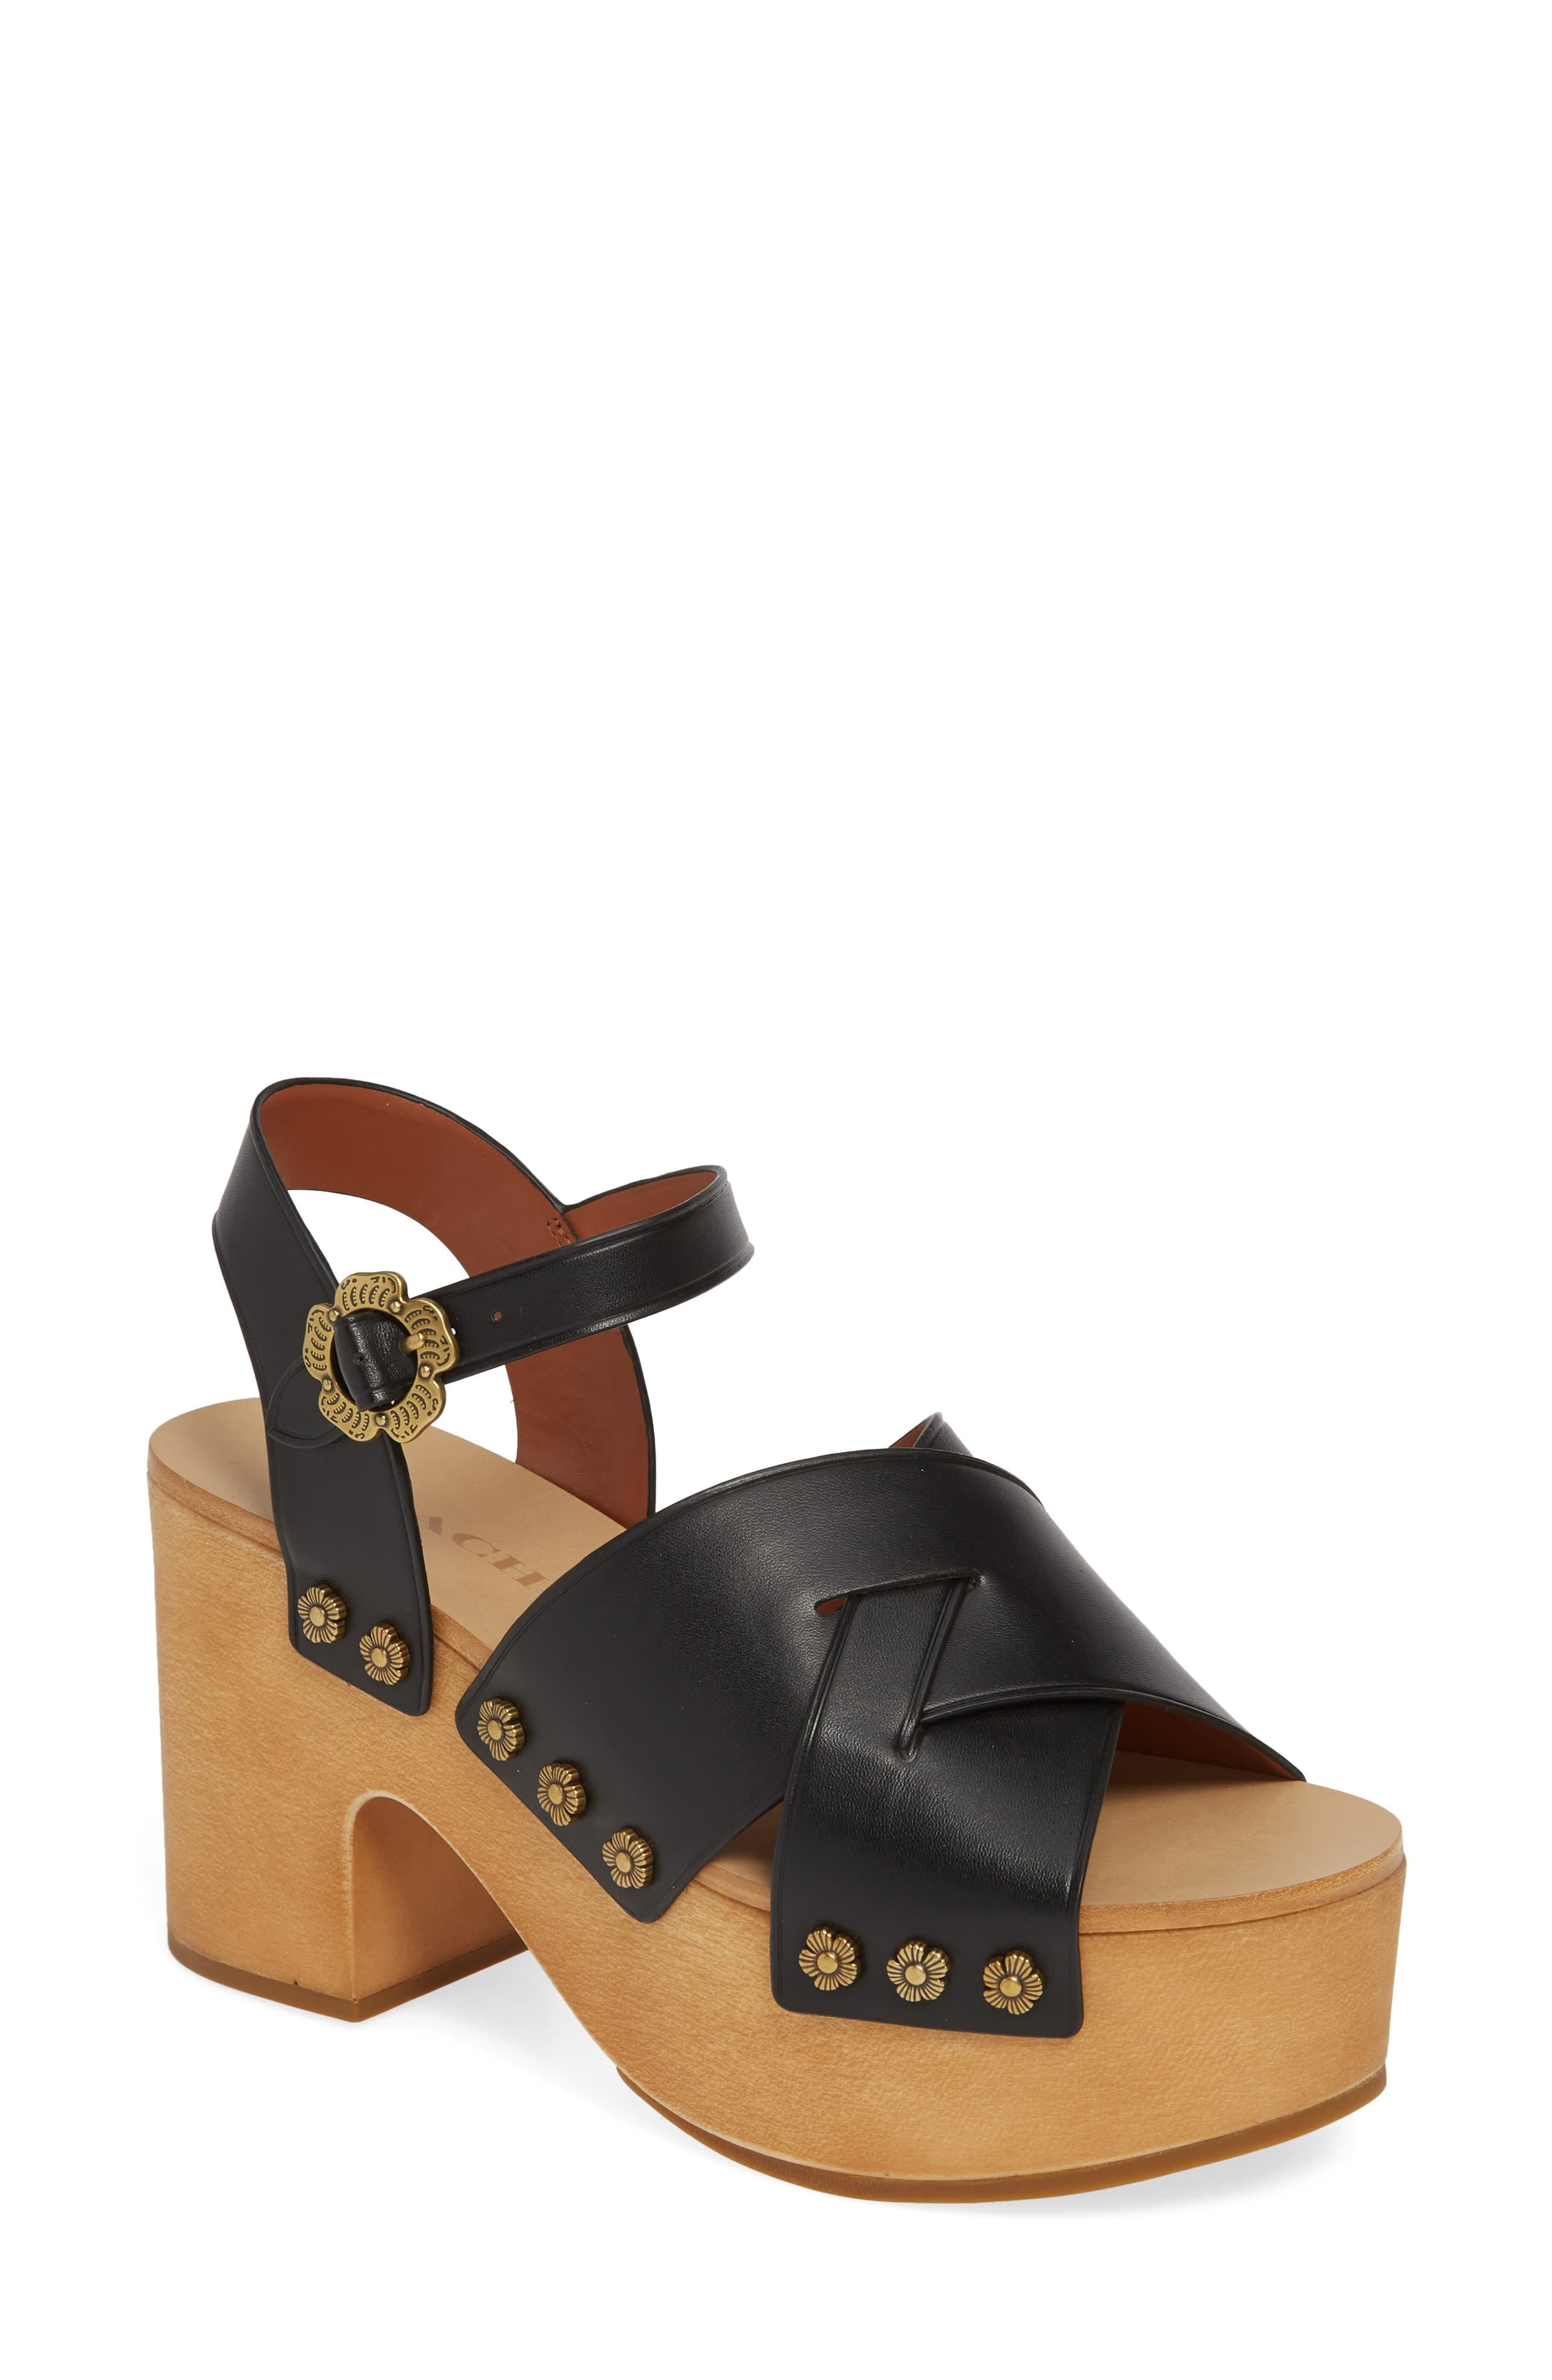 COACH Nessa Clog Platform Sandal in